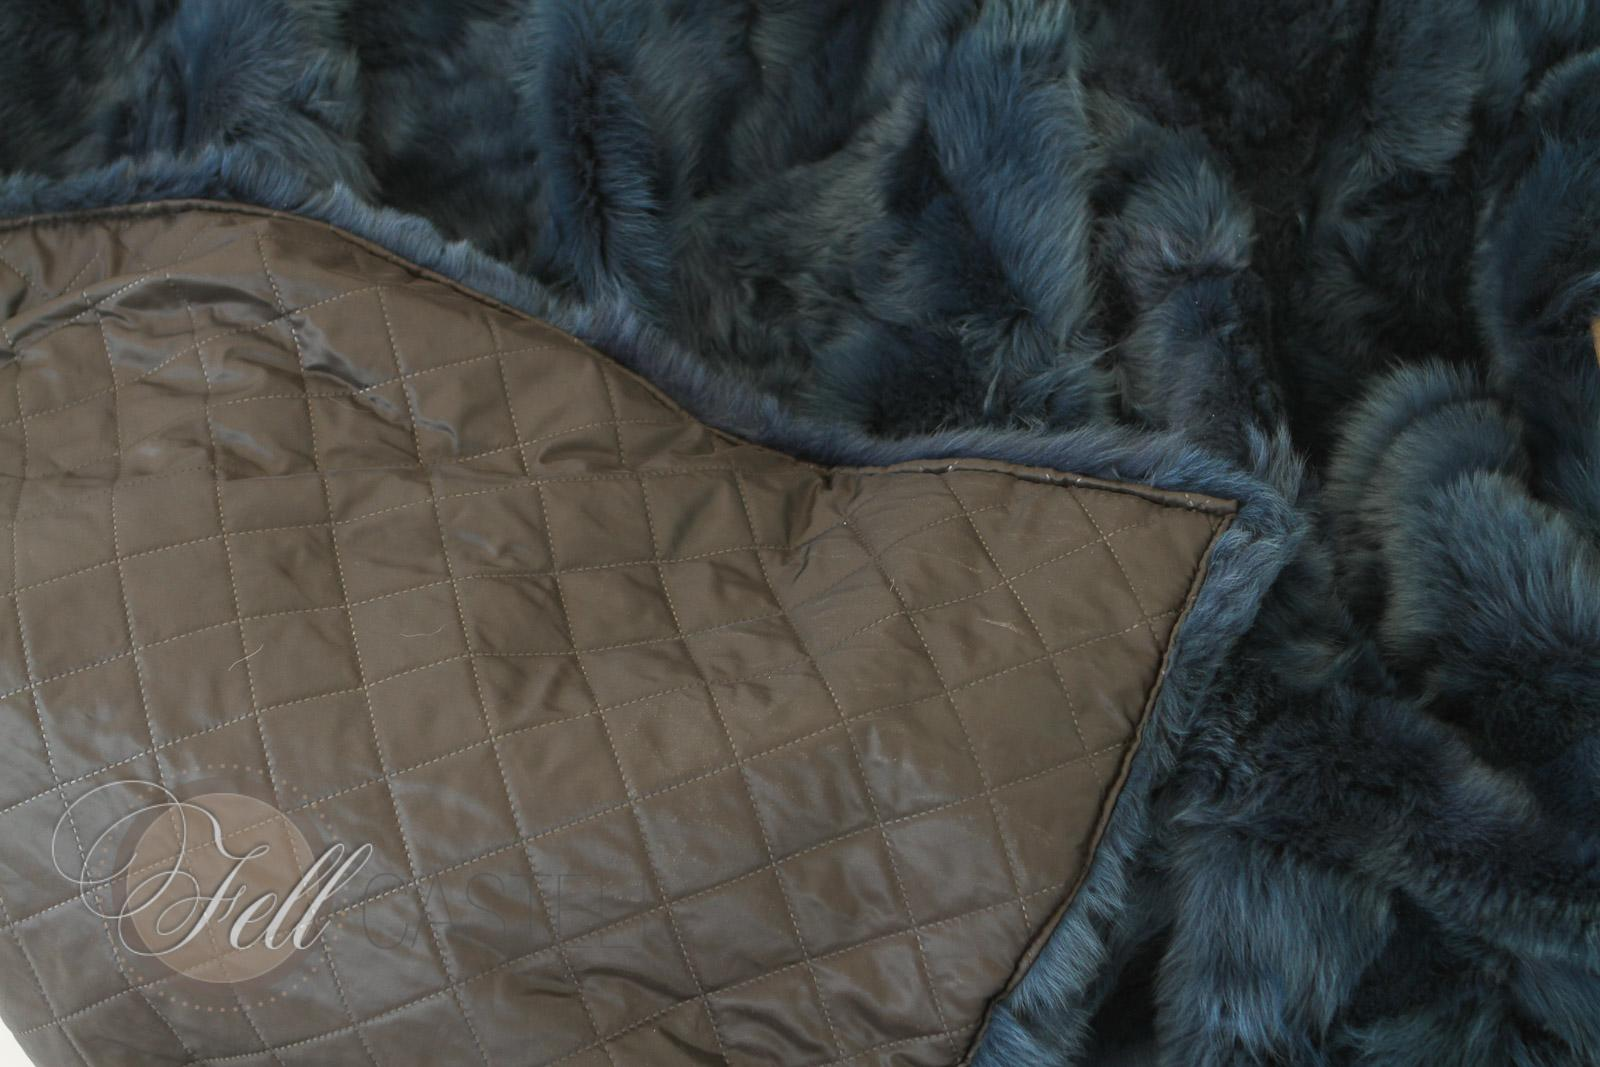 lambskin blanket 78x61 inch petrol toscana shearling patchwork